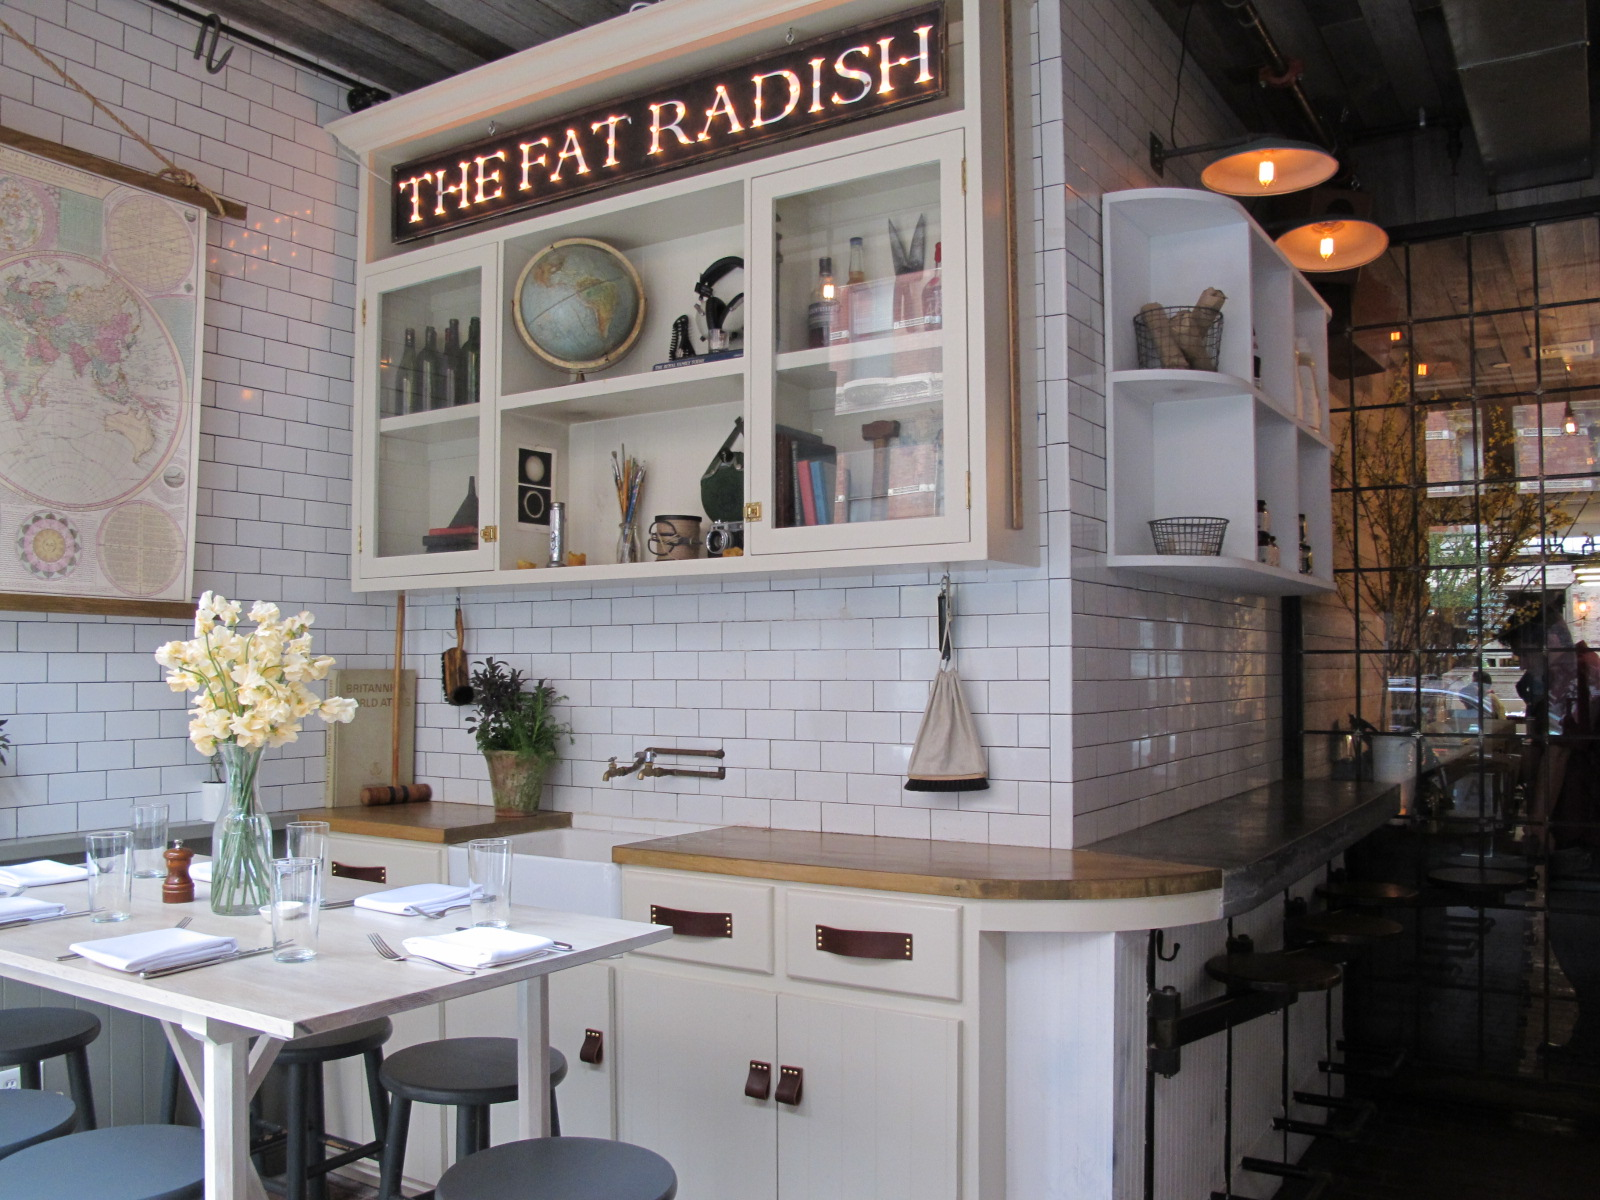 The Fat Radish Front Redesign Katesdougherty